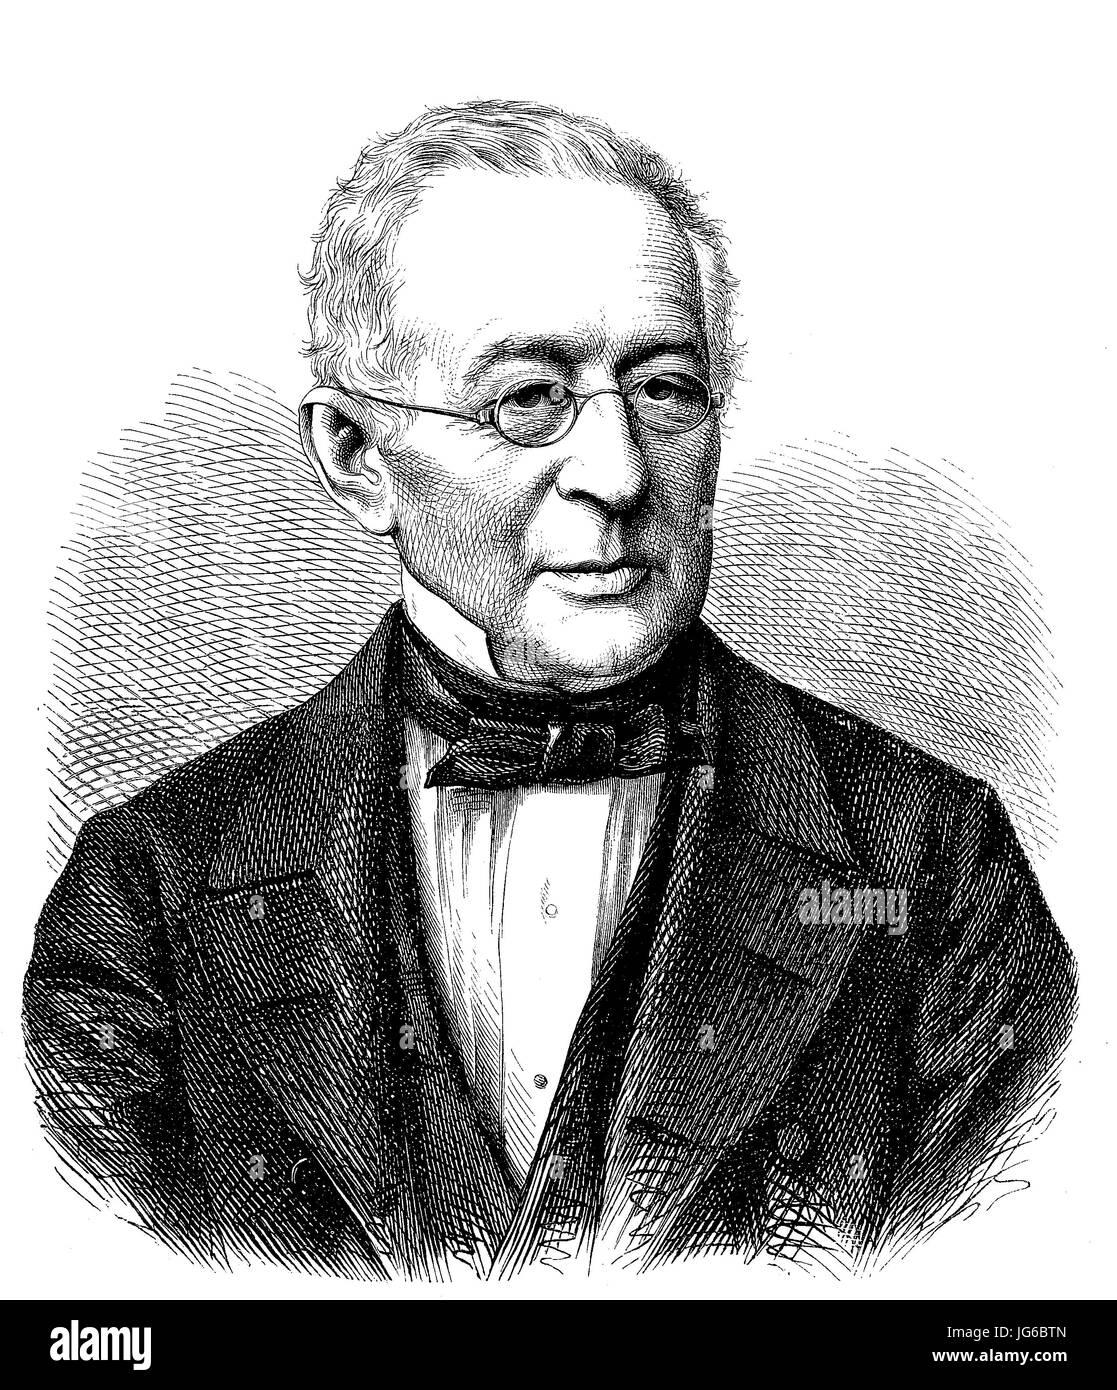 Digital improved:, Alexander Mikhailovich Gorchakov- 1798 - 1883, was a Russian diplomat and statesman, Russia, Stock Photo